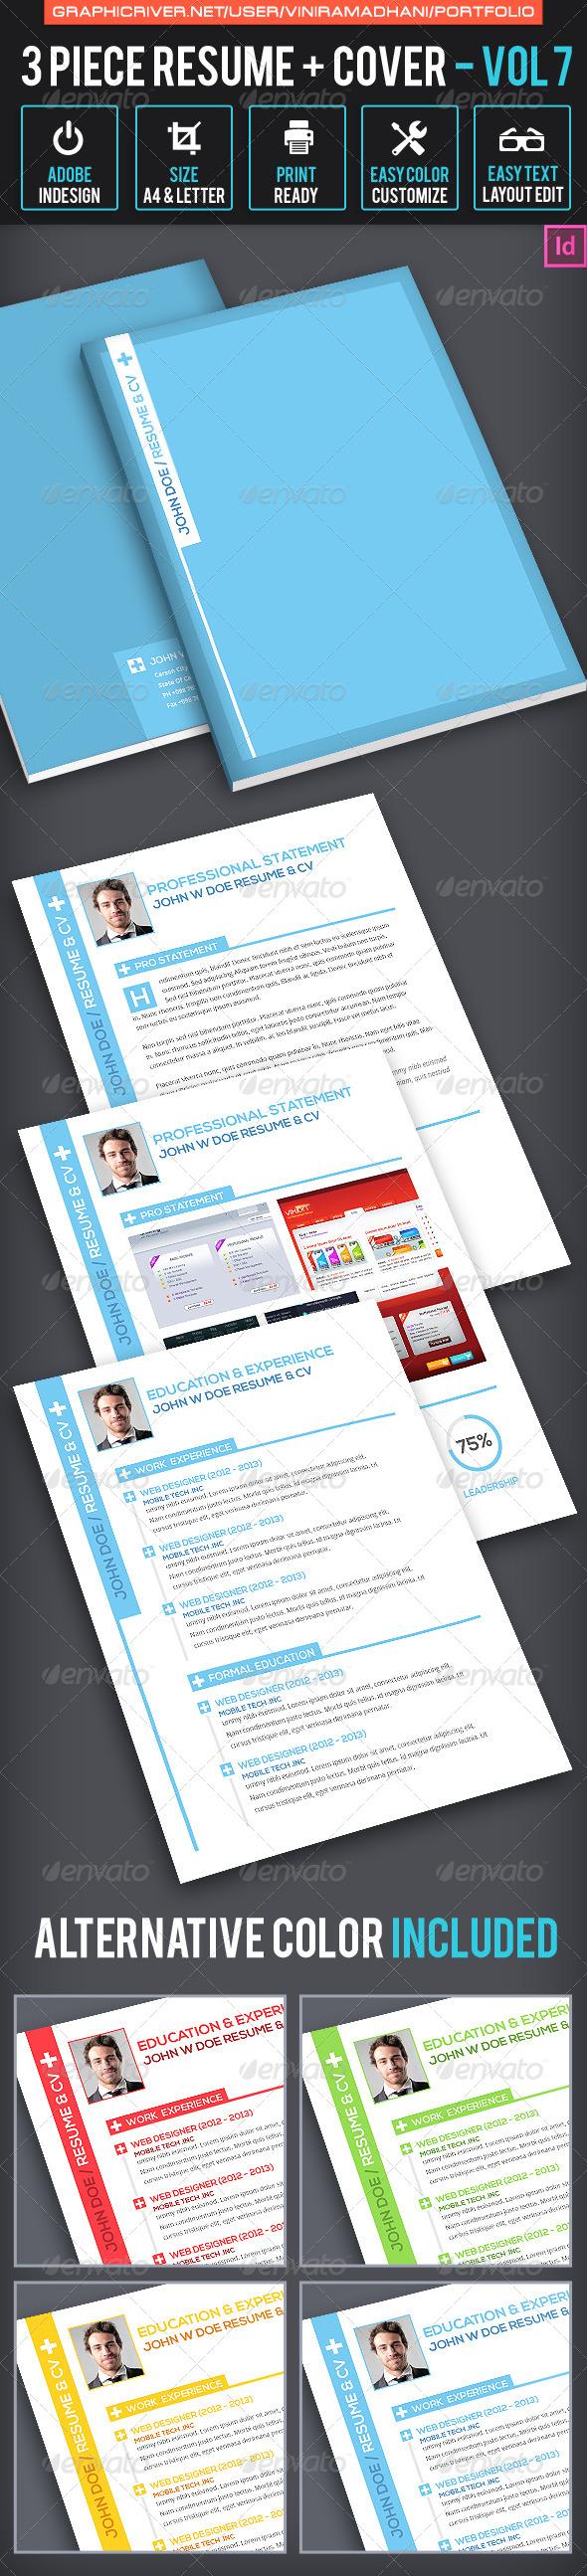 Simple Resume CV Volume 7 - Resumes Stationery